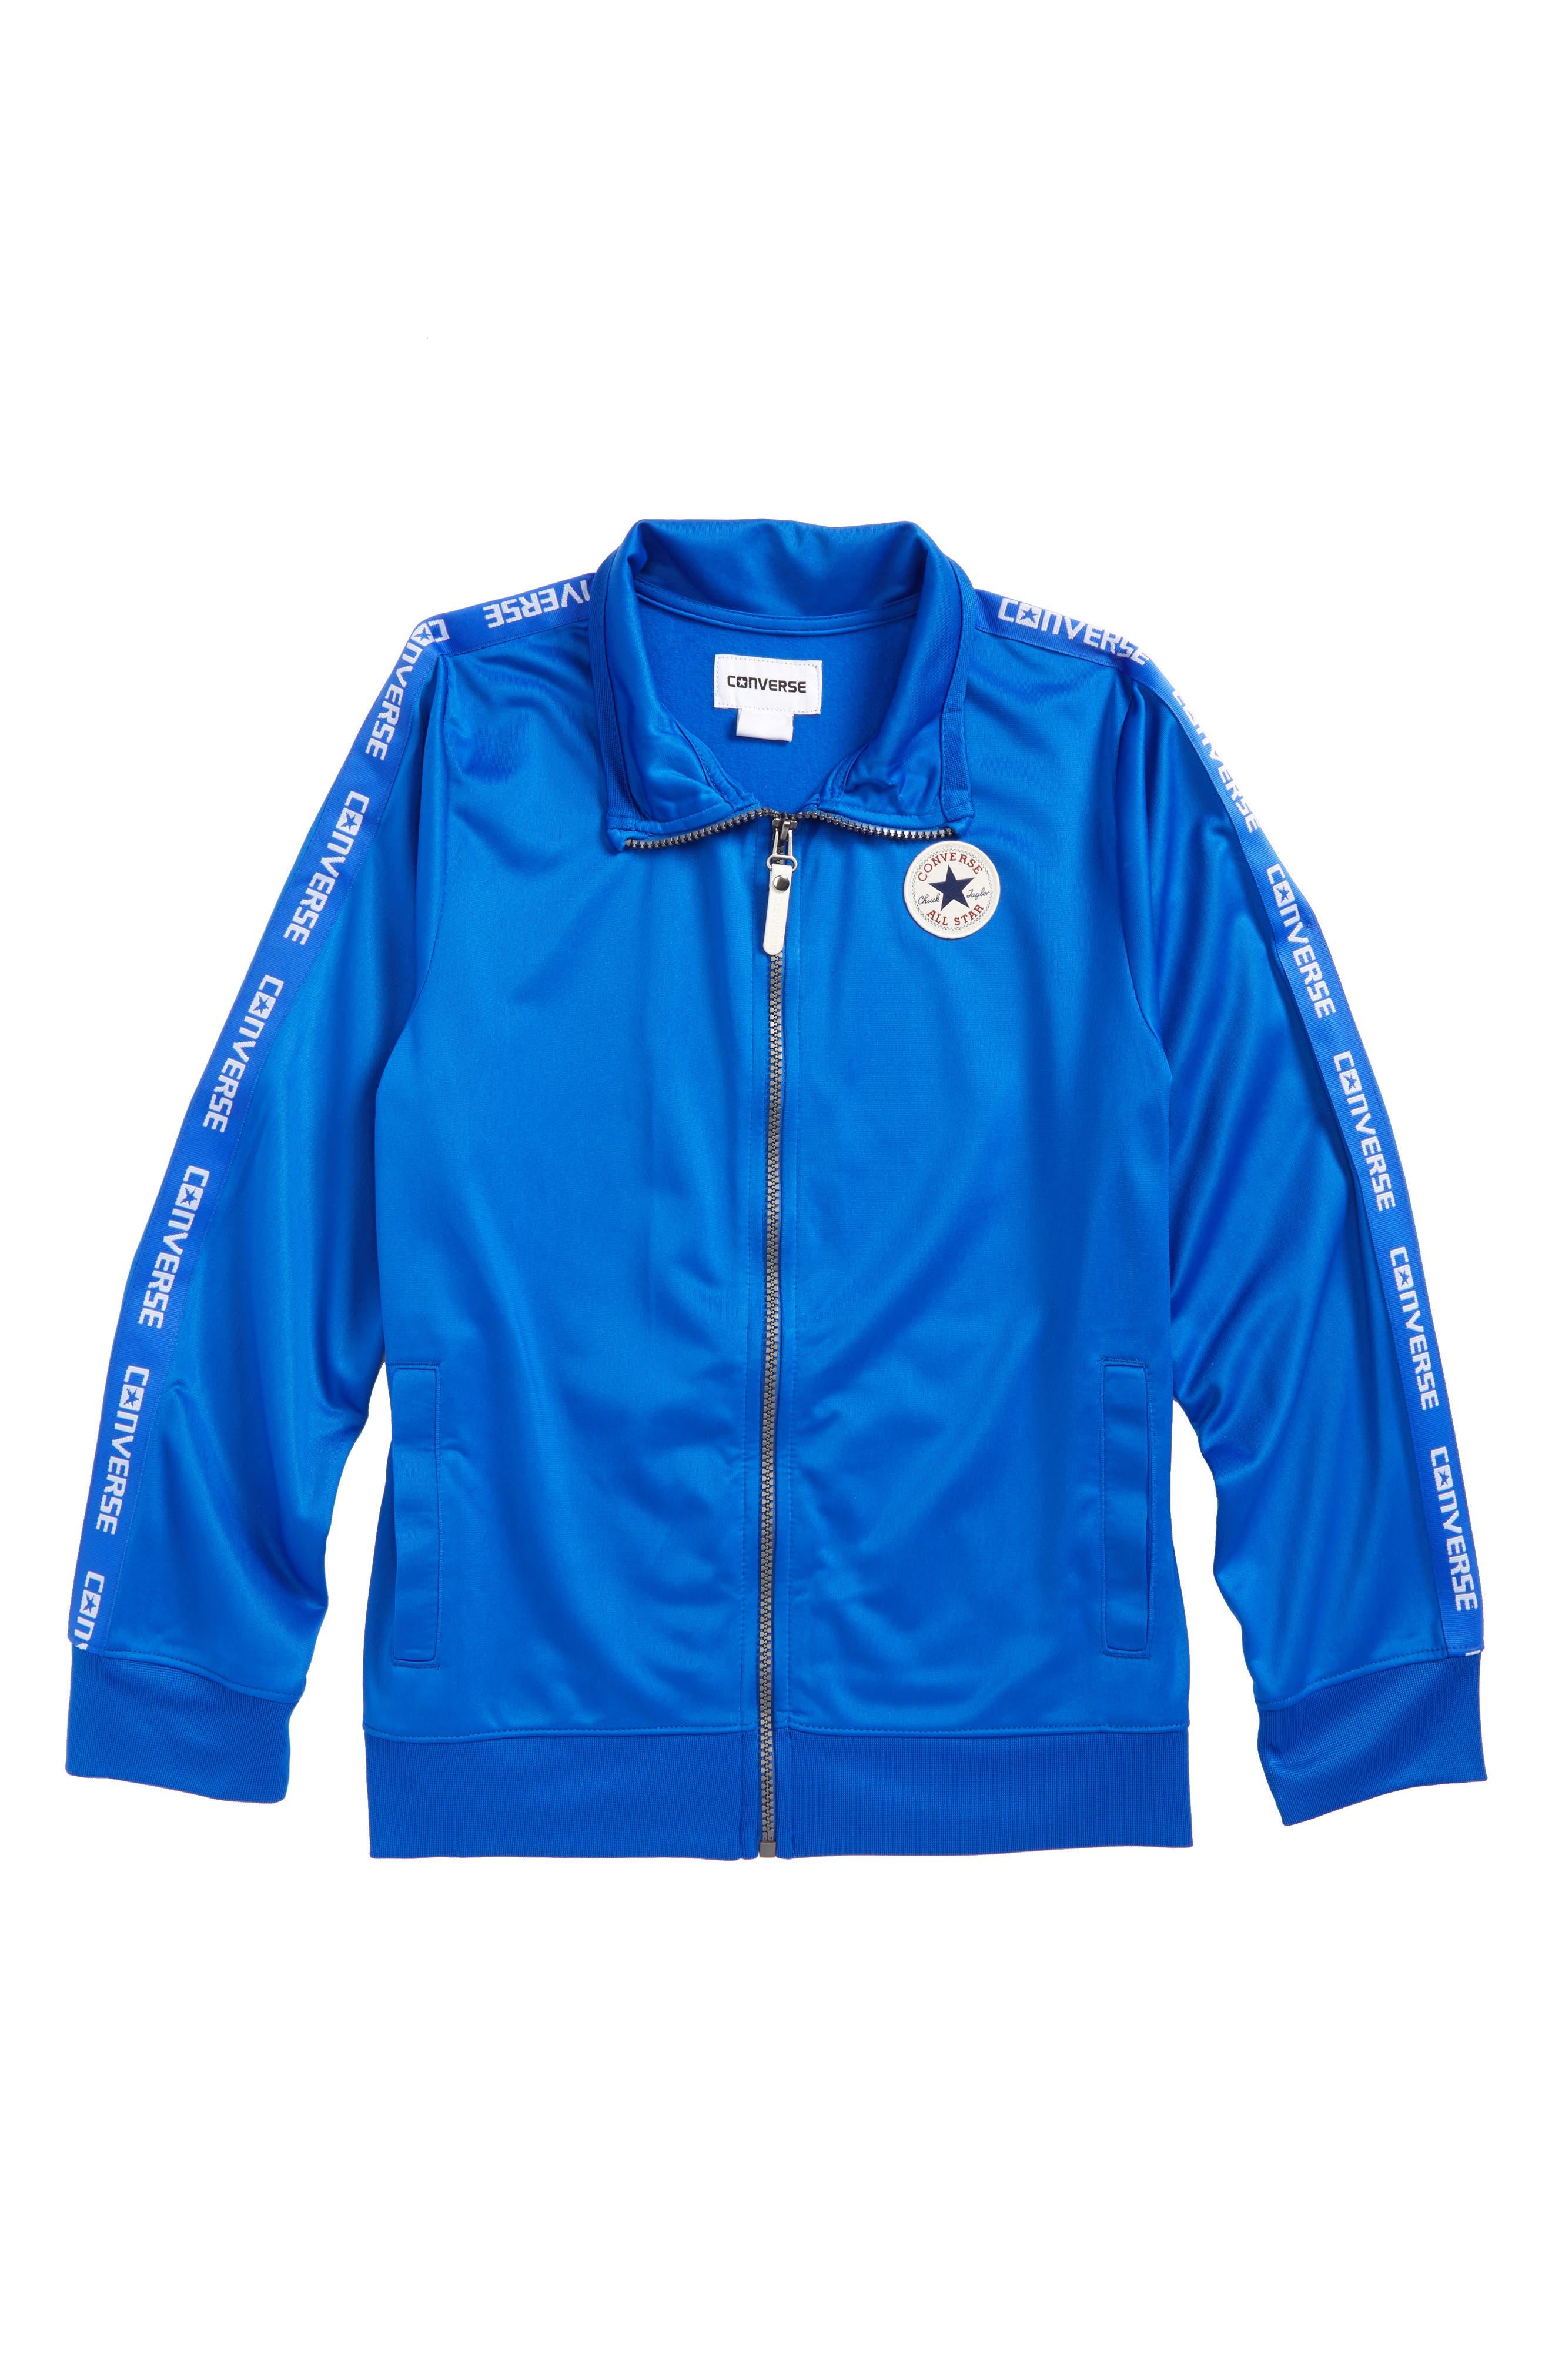 Alternate Image 1 Selected - Converse Logo Warm-Up Jacket (Big Boys)